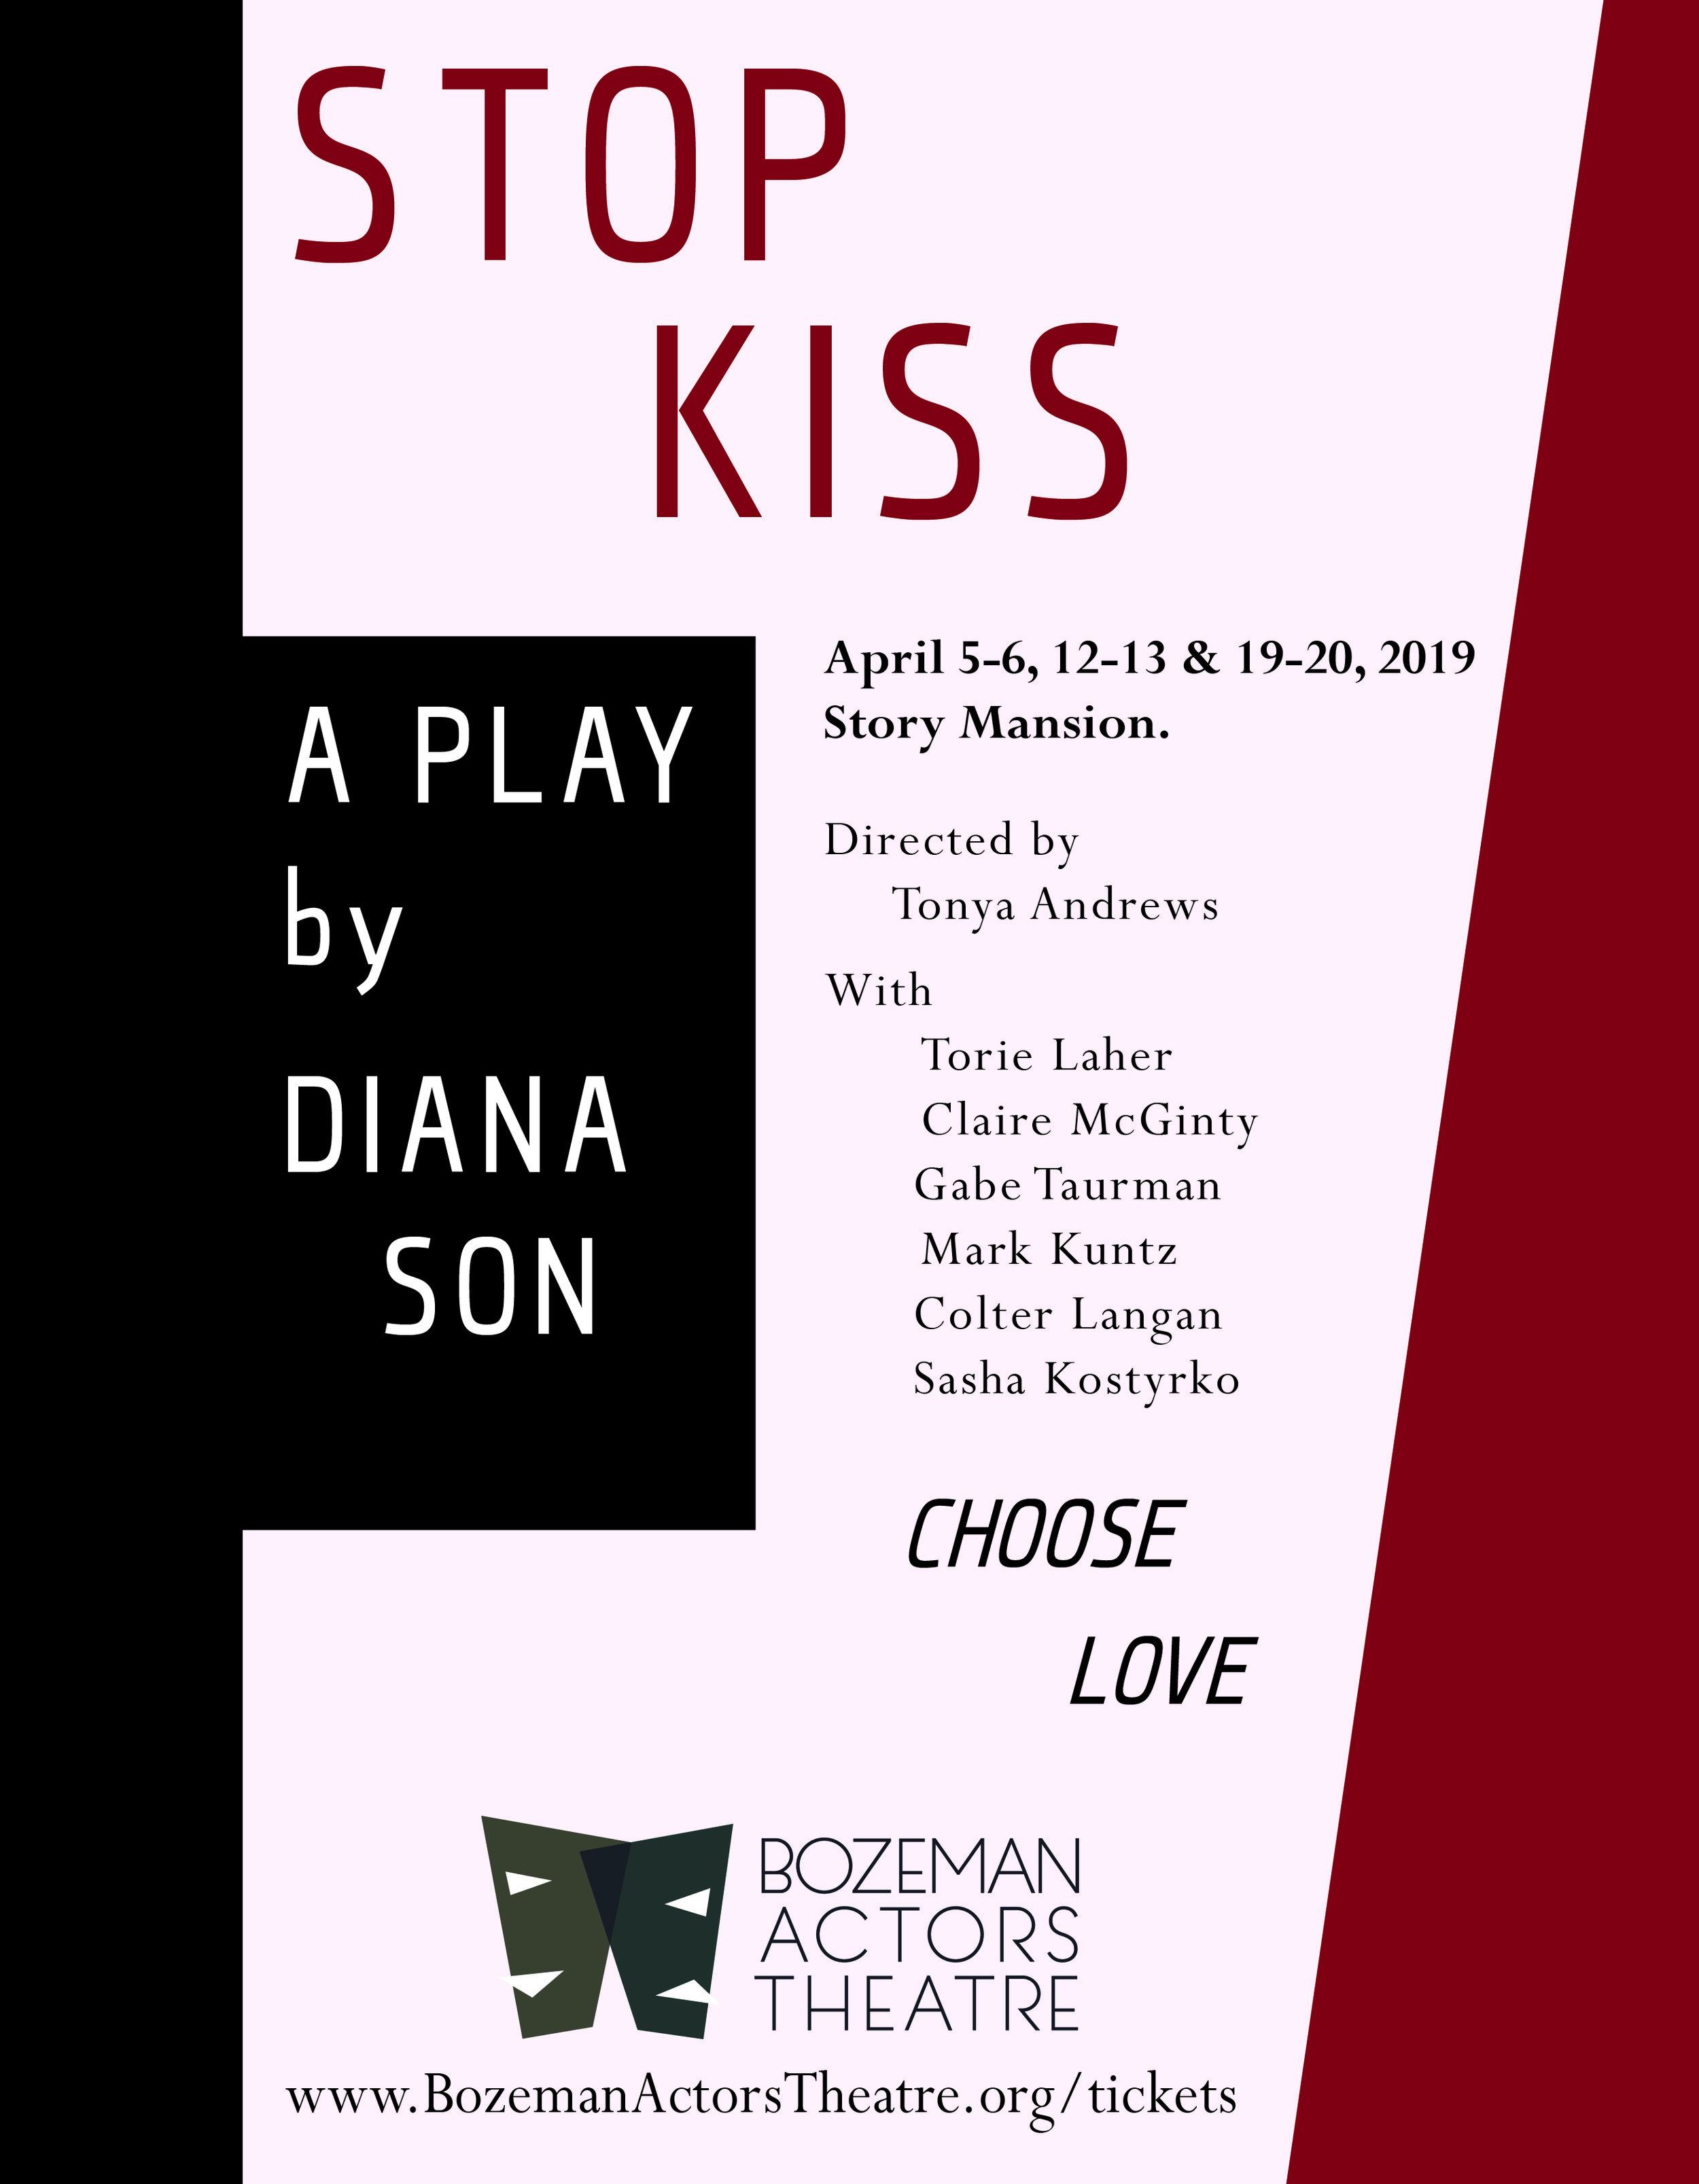 Stop Kiss Final Draft 8.5 x 11.jpg